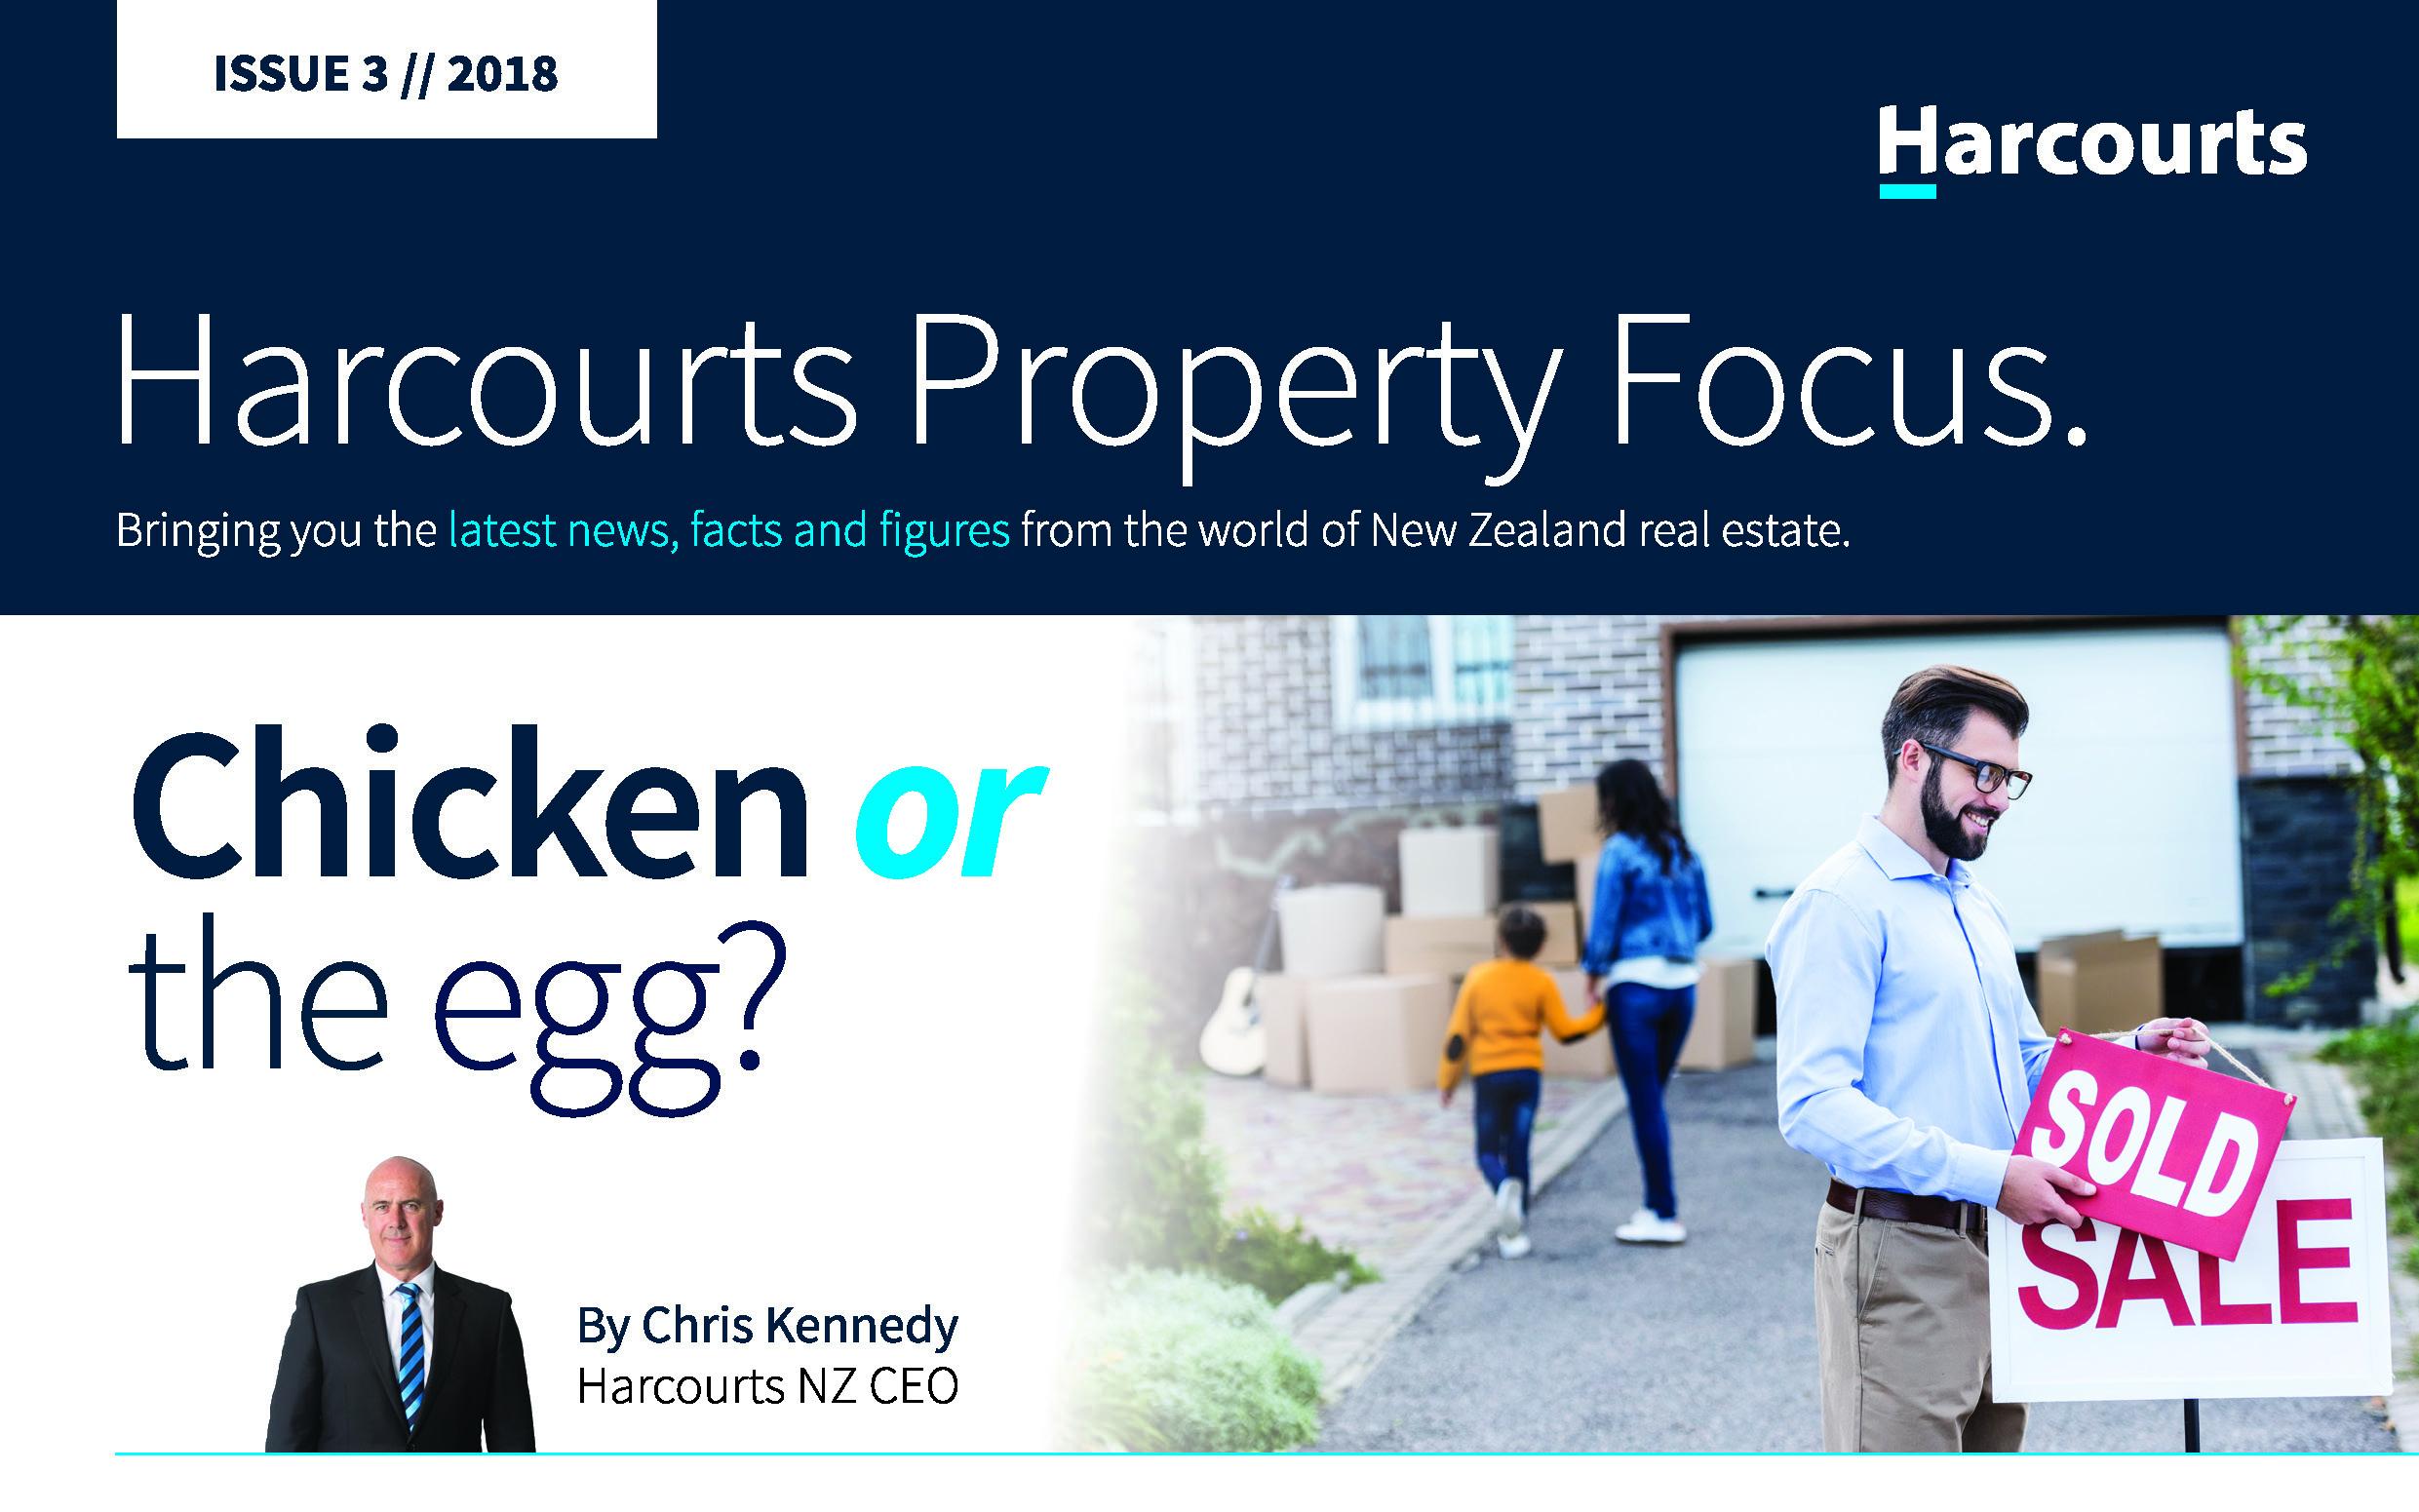 201805 Property Focus v2_Page_1 copy